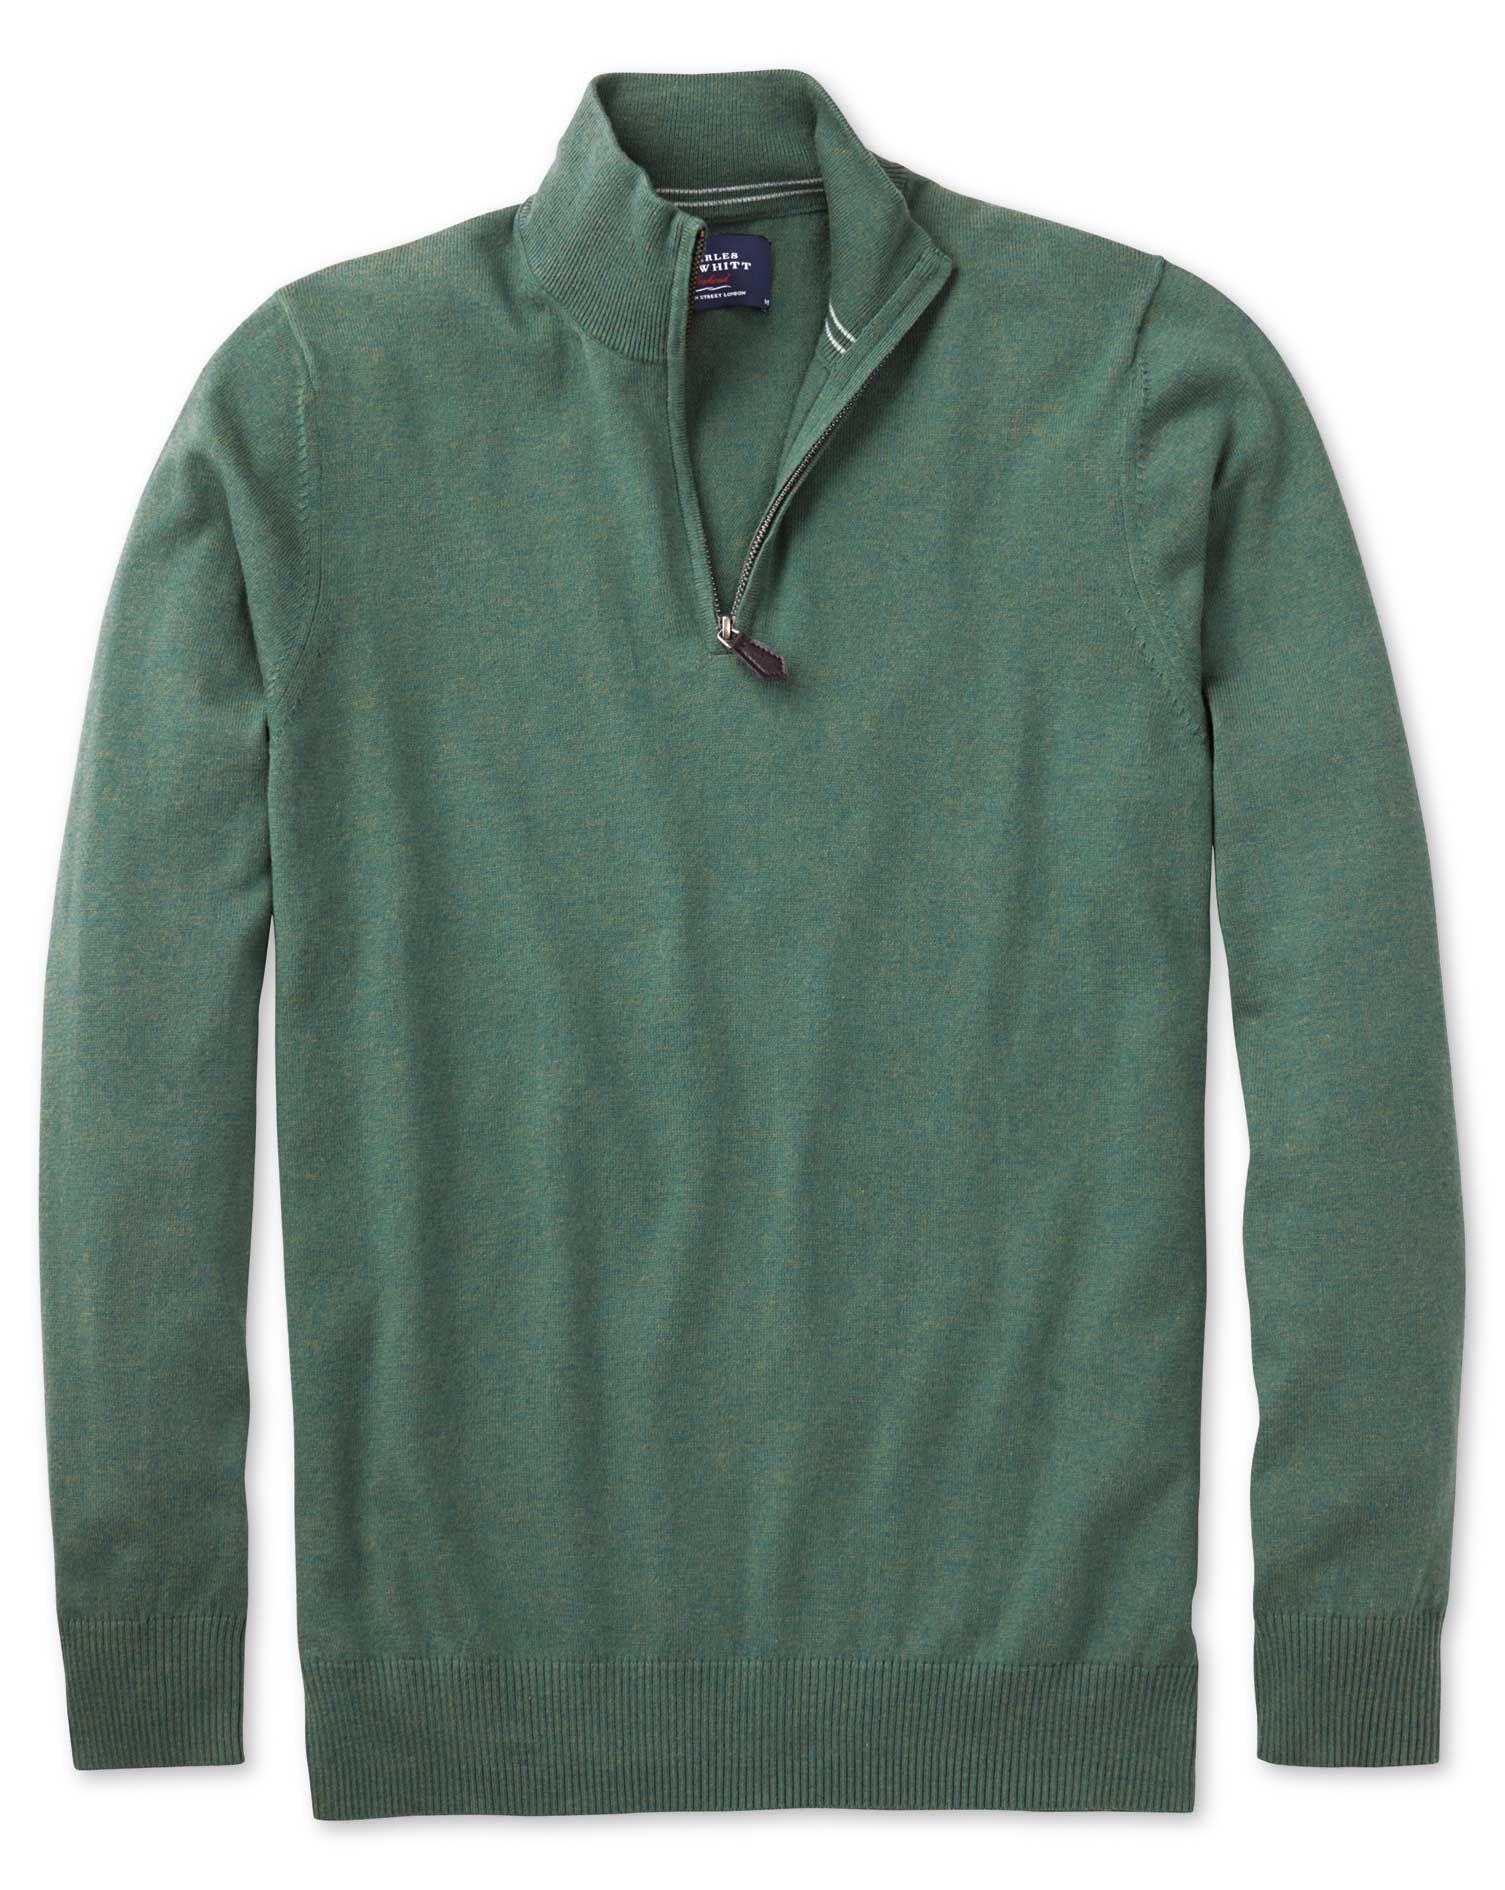 Mid Green Cotton Cashmere Zip Neck Jumper Size XXXL by Charles Tyrwhitt